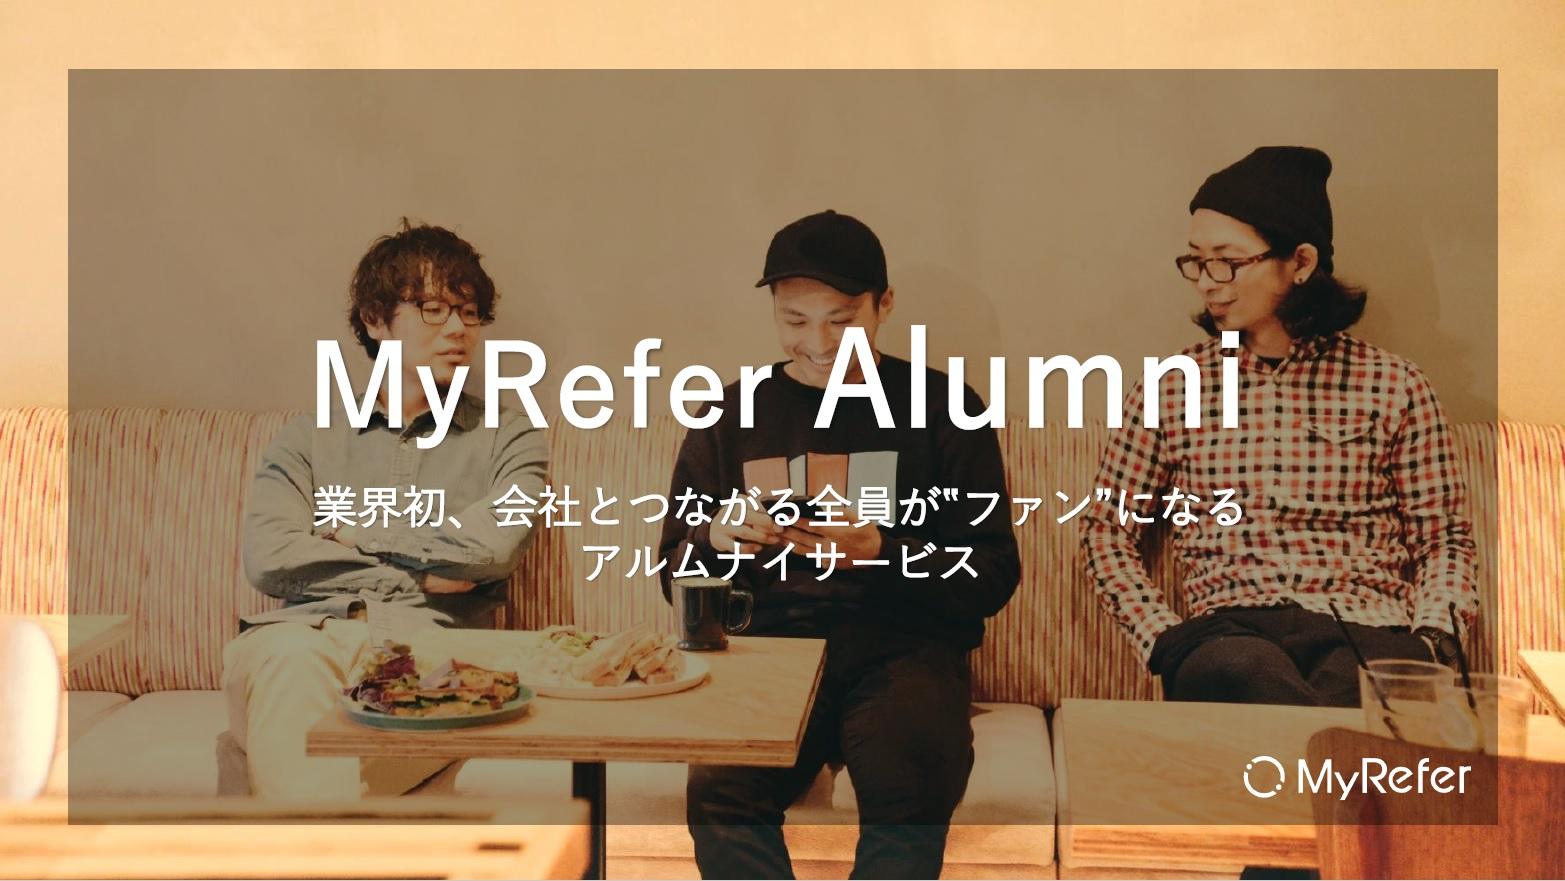 MyRefer Alumni | 退職社員を資産化するアルムナイ採用